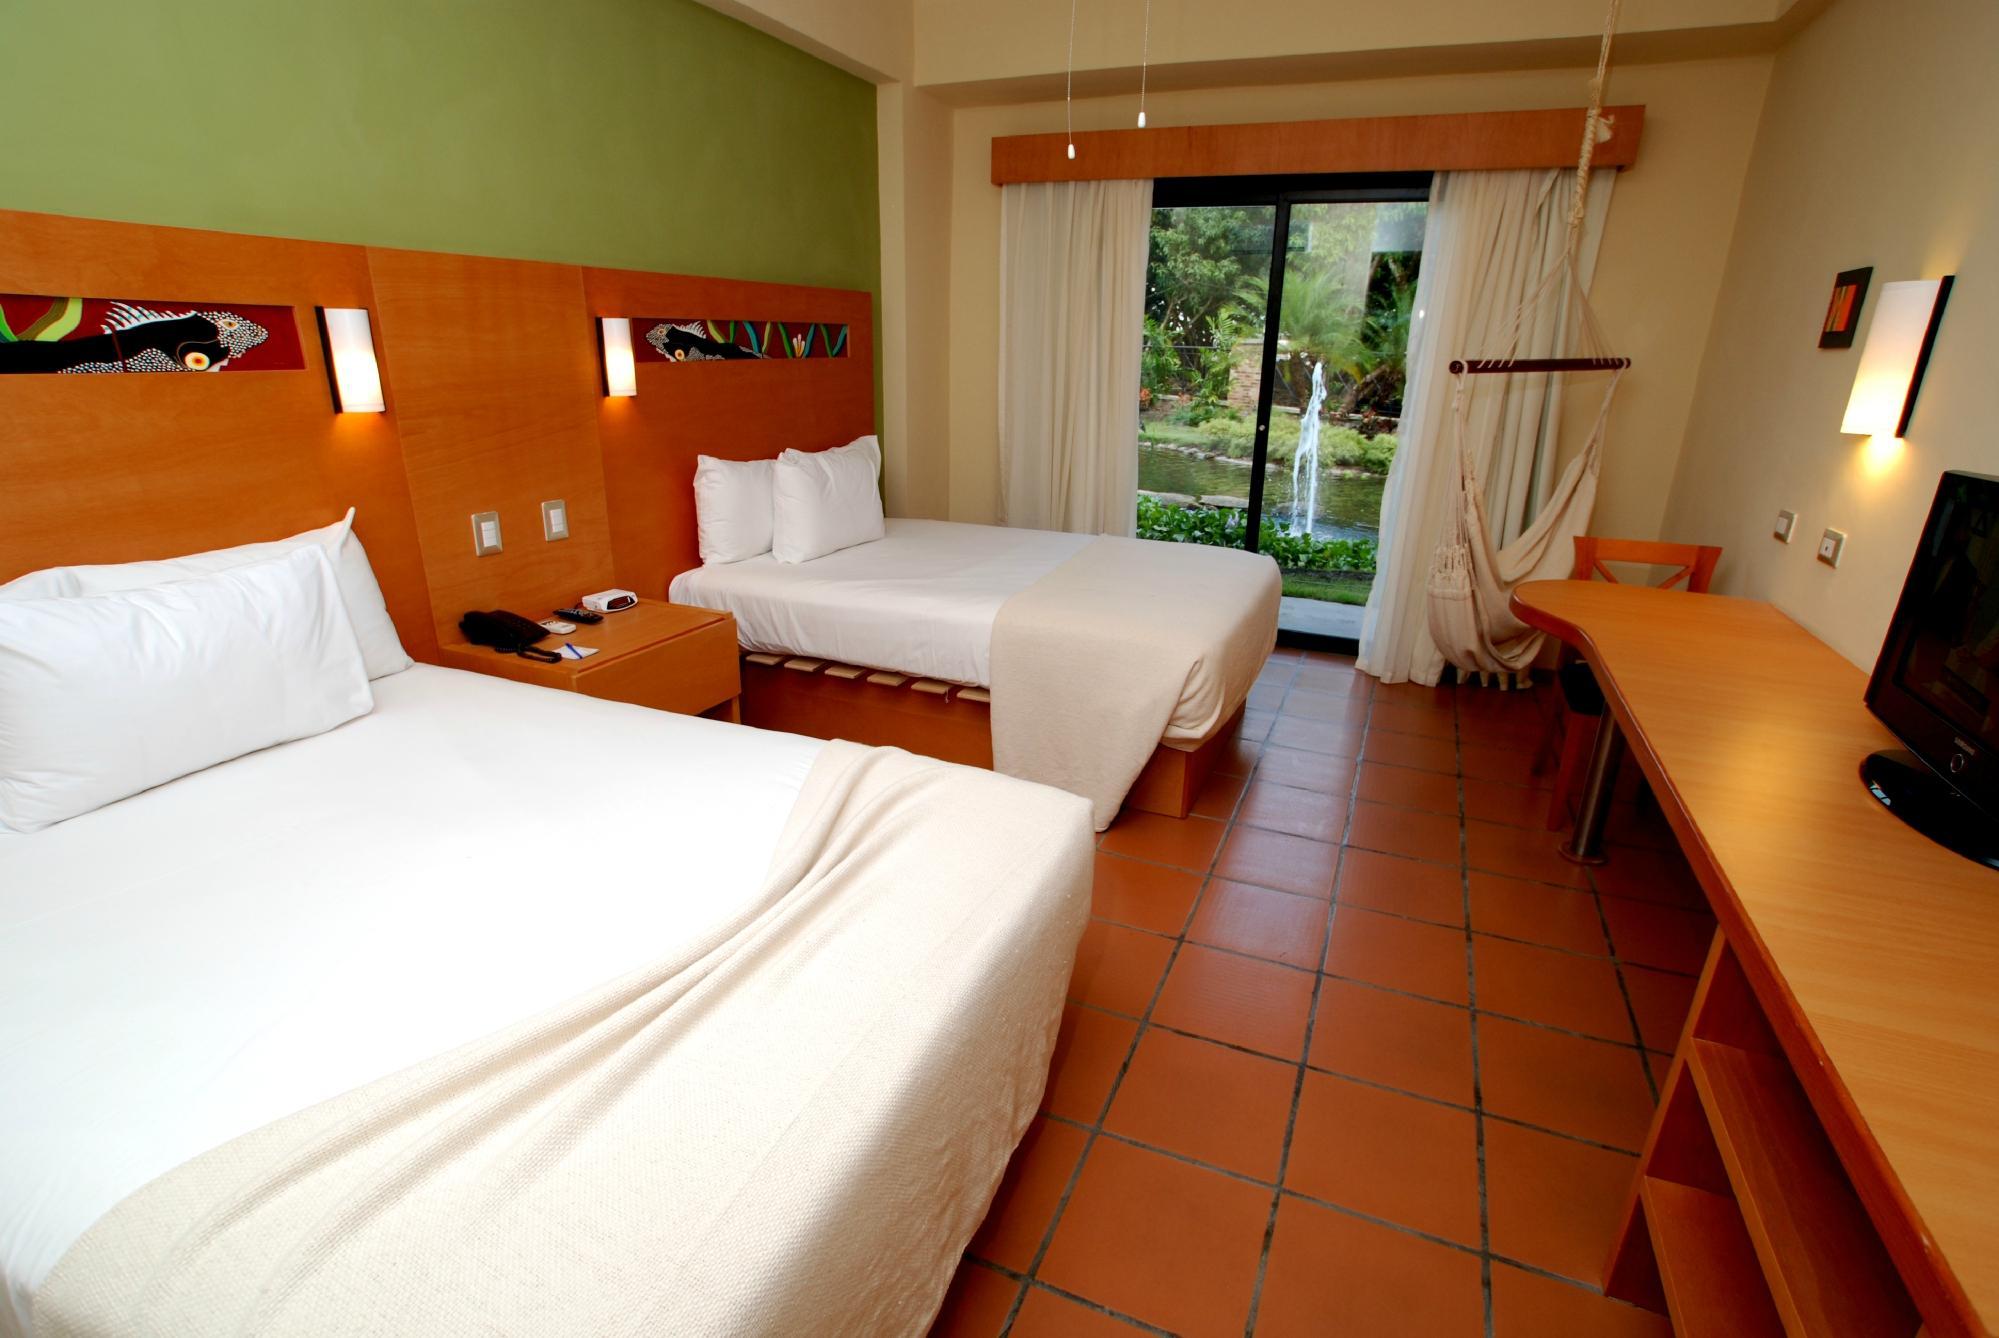 Eco Inn Hotel Las Villas